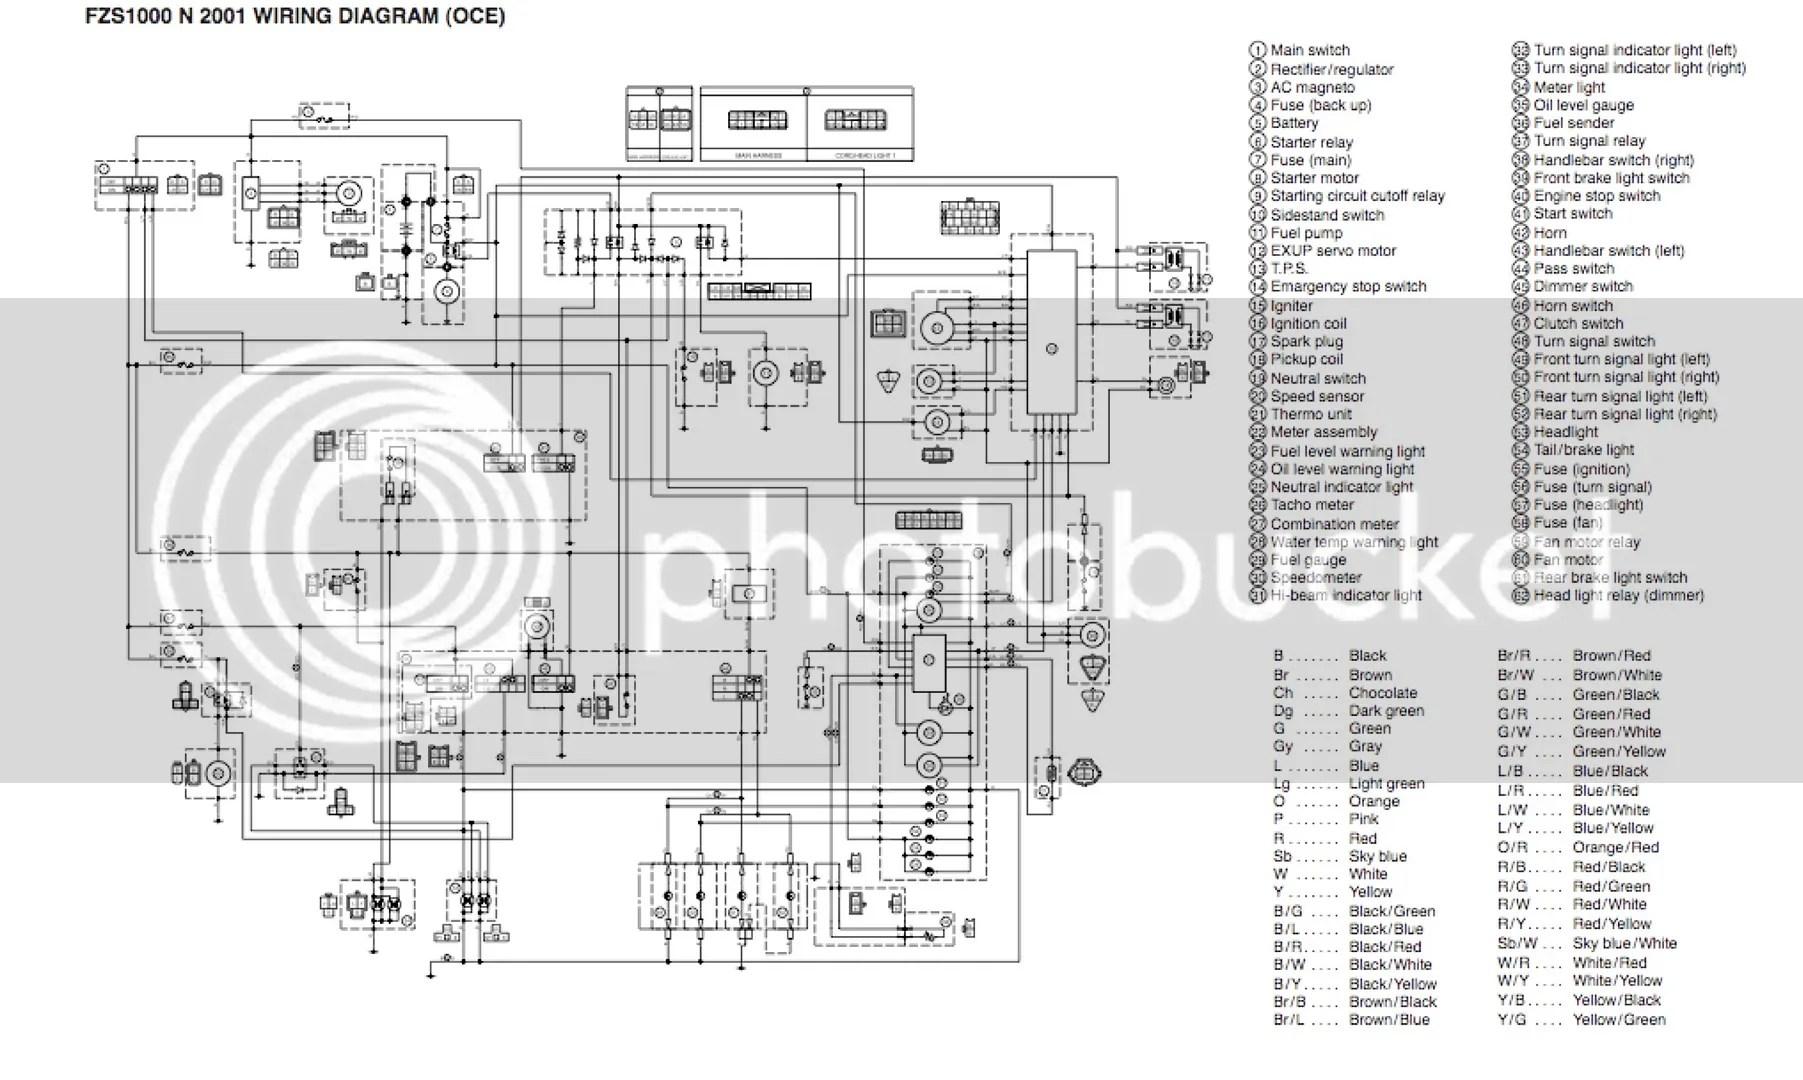 1980 Yamaha Xs850 Wiring Diagram. Diagram. Auto Wiring Diagram